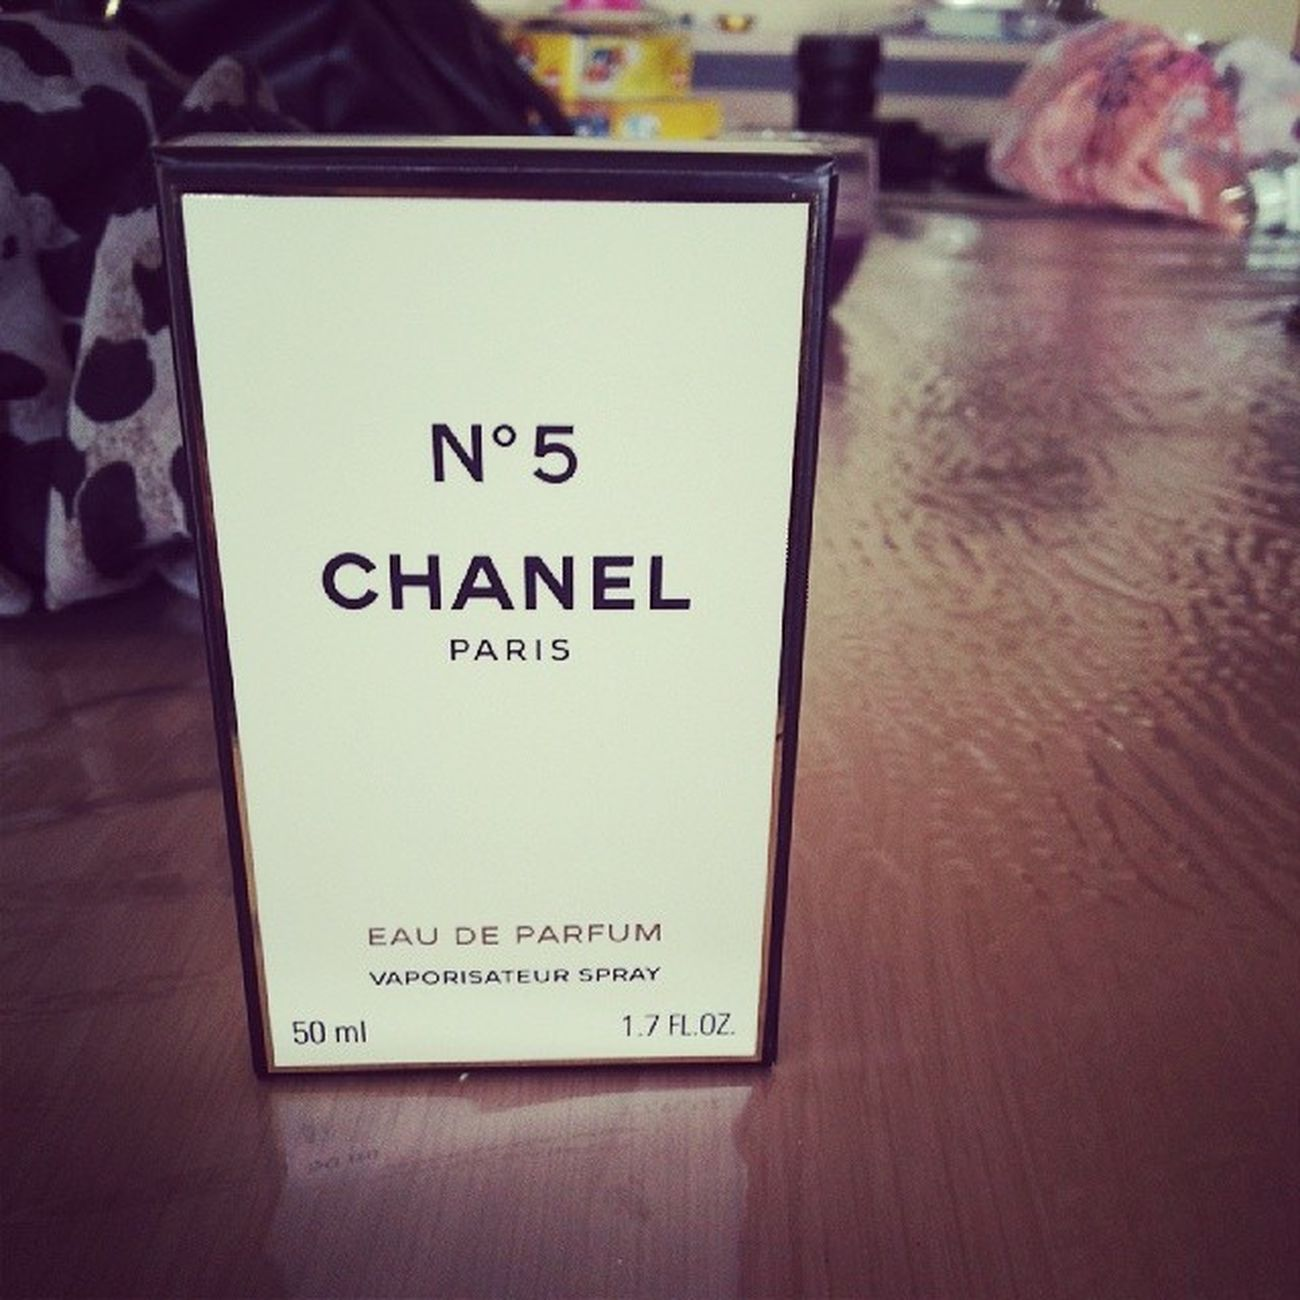 Loveee Chanel No5  Eaudeparfumn Paris